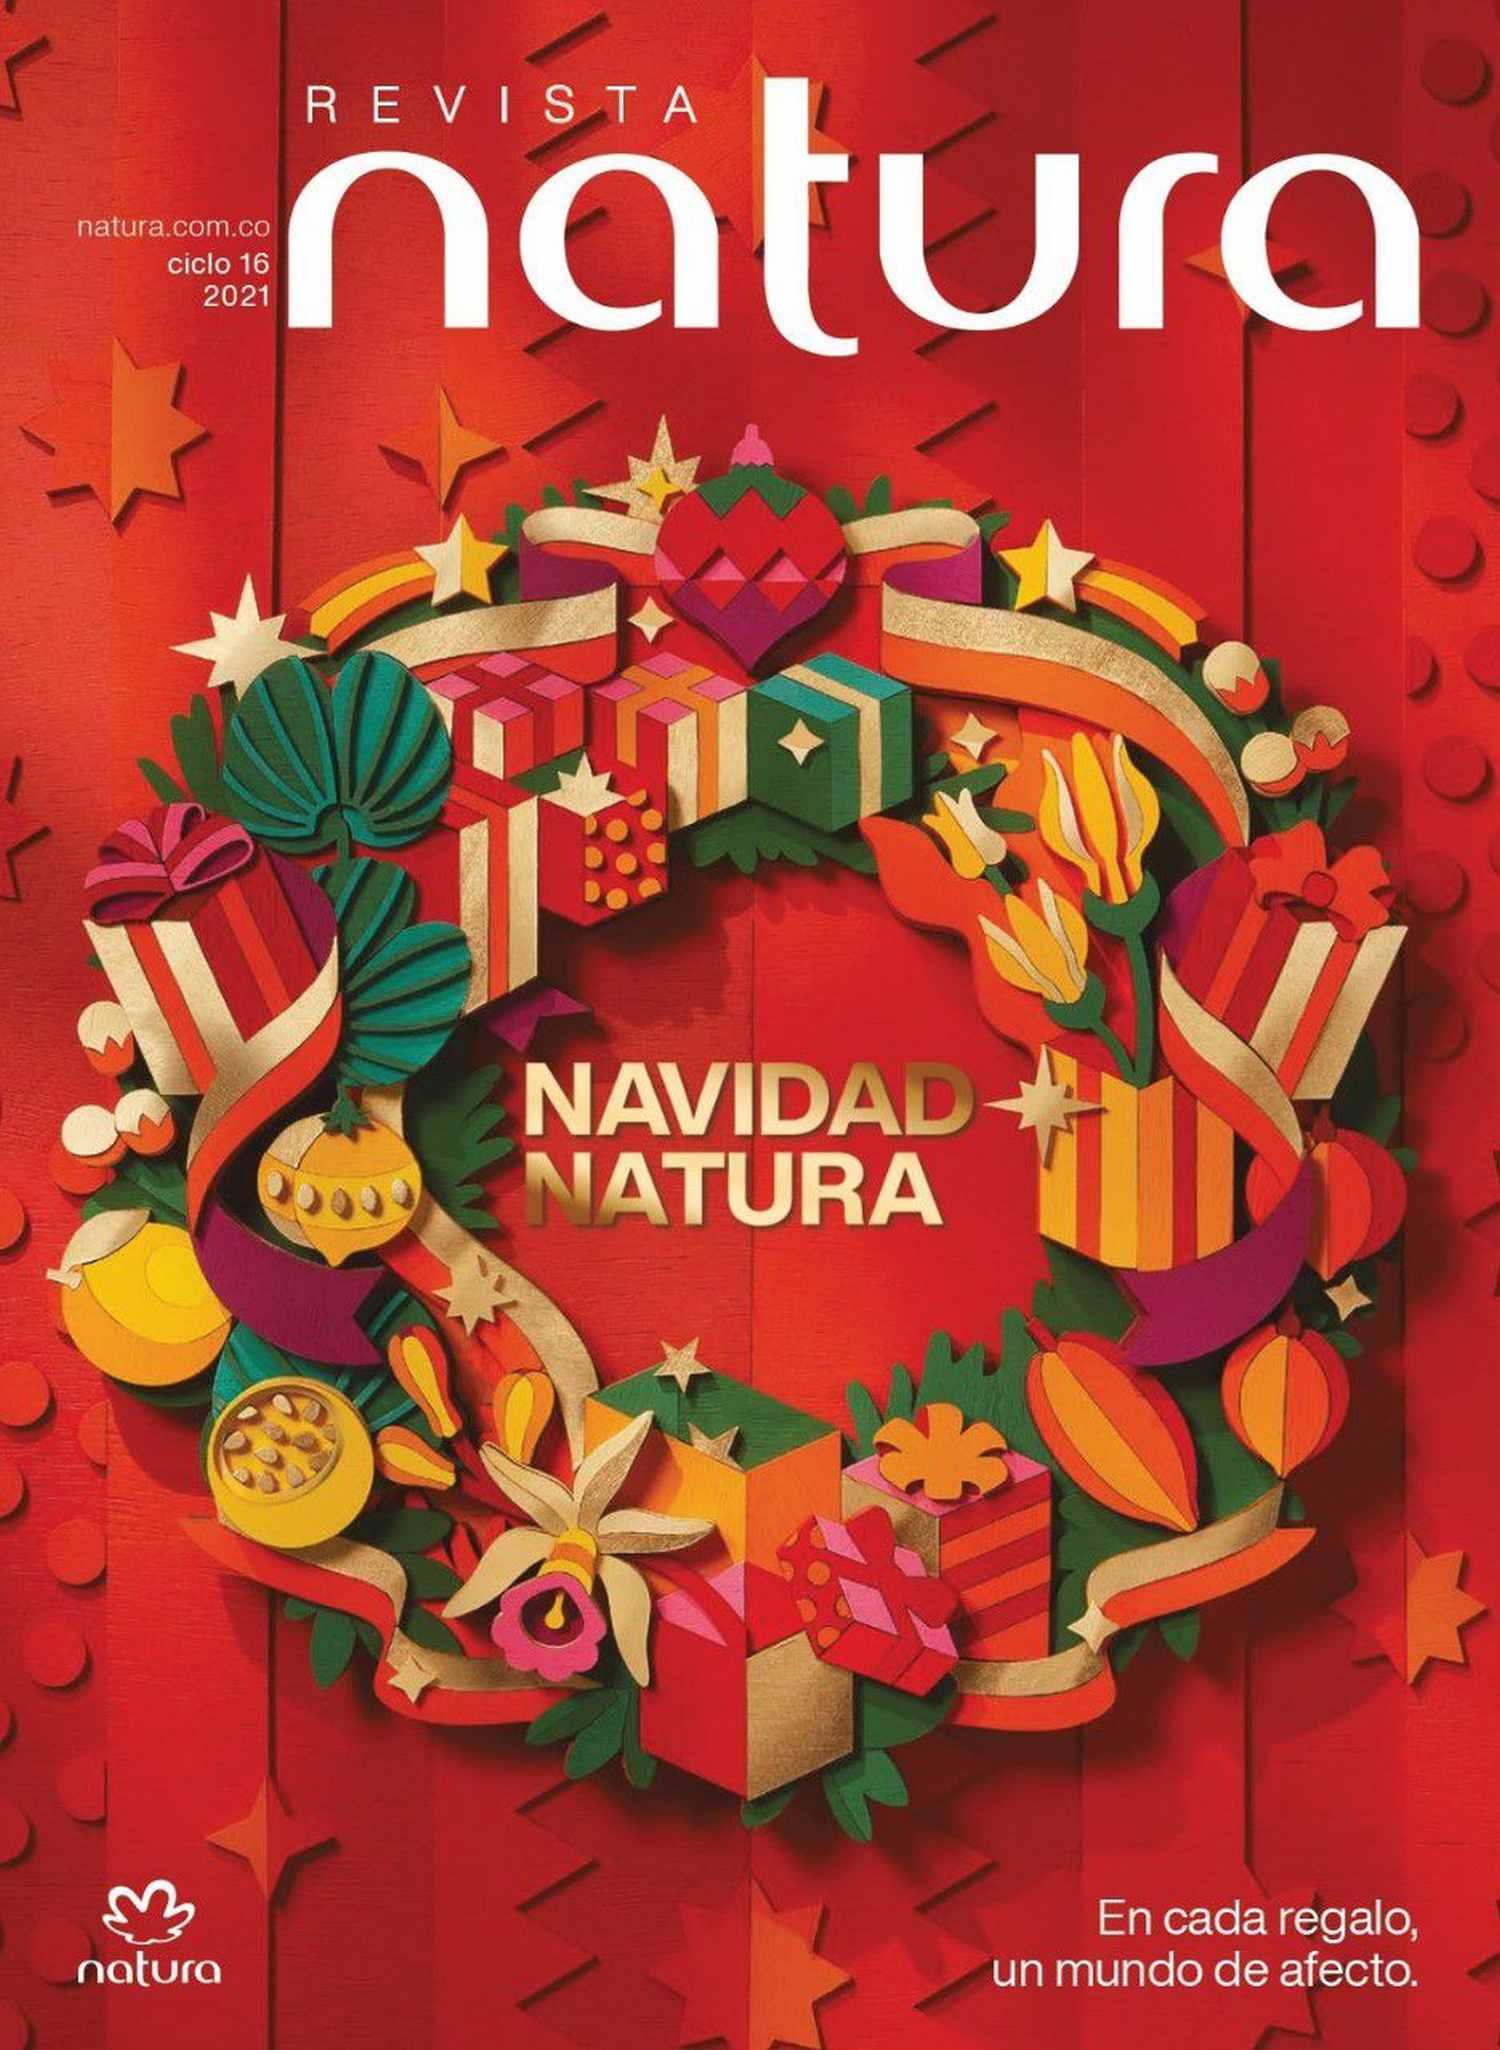 Catálogo Natura Ciclo 16 2021 Colombia